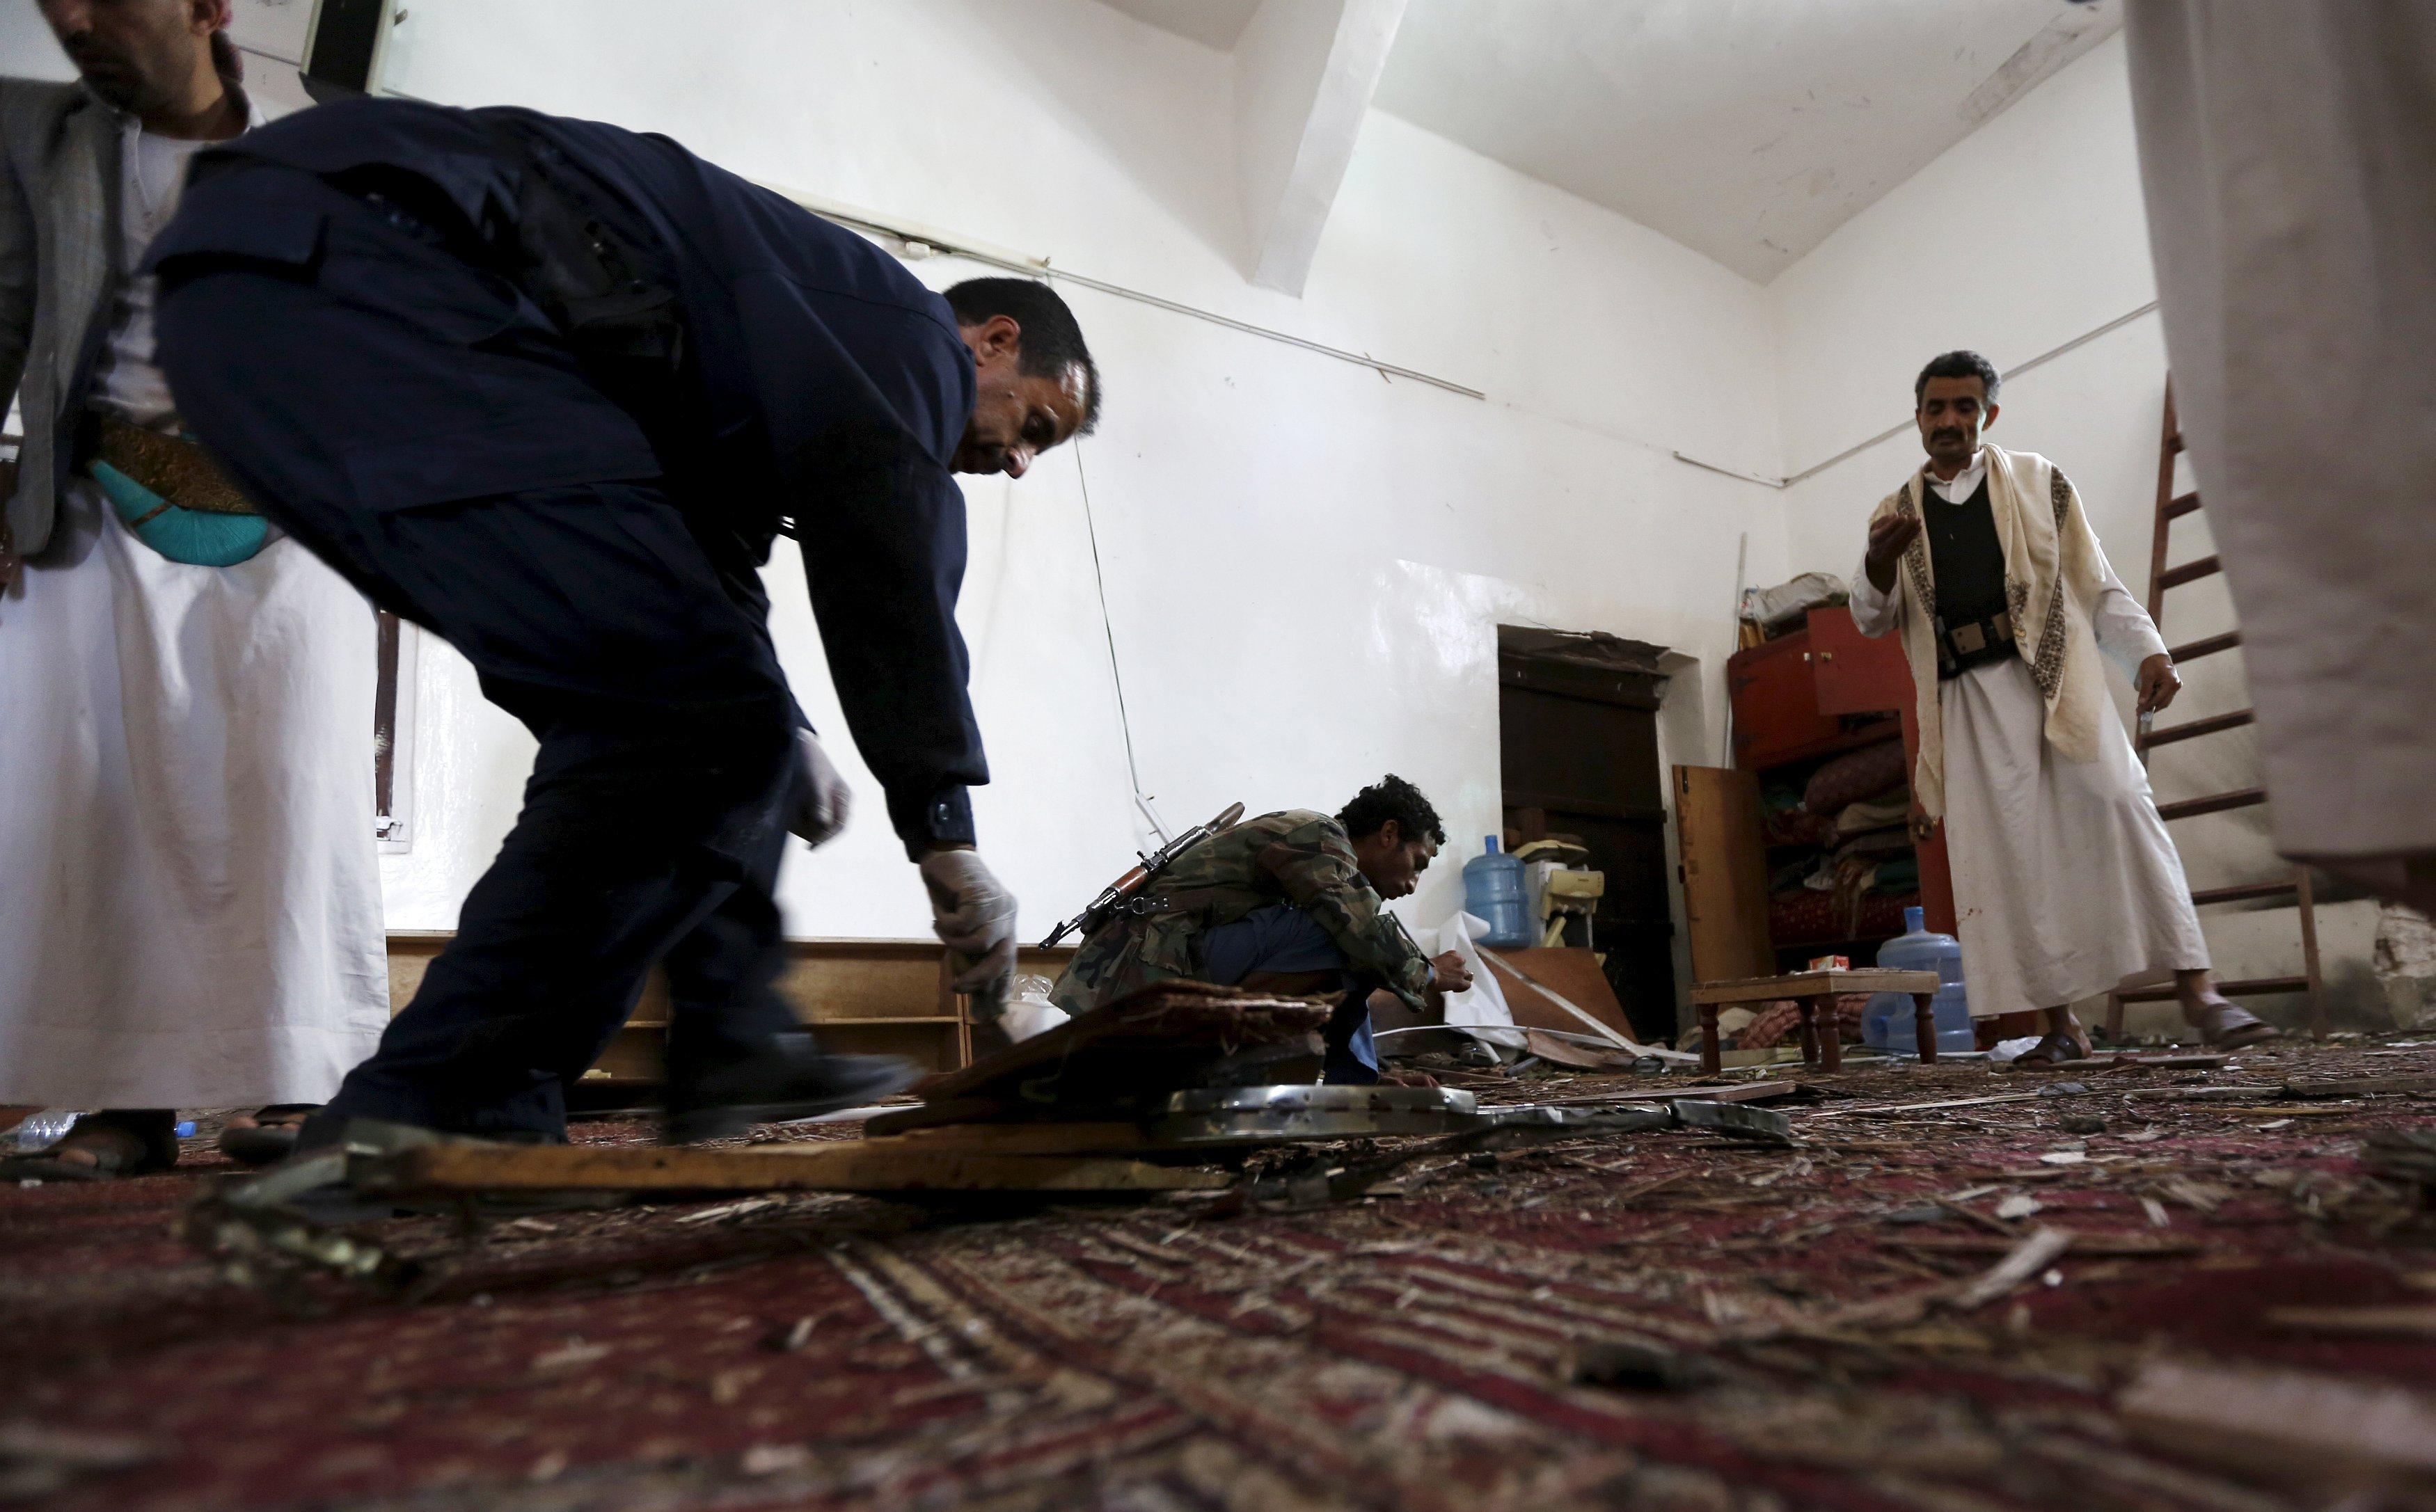 Islamic State claims Yemen mosque attack: Islamic State Twitter statement